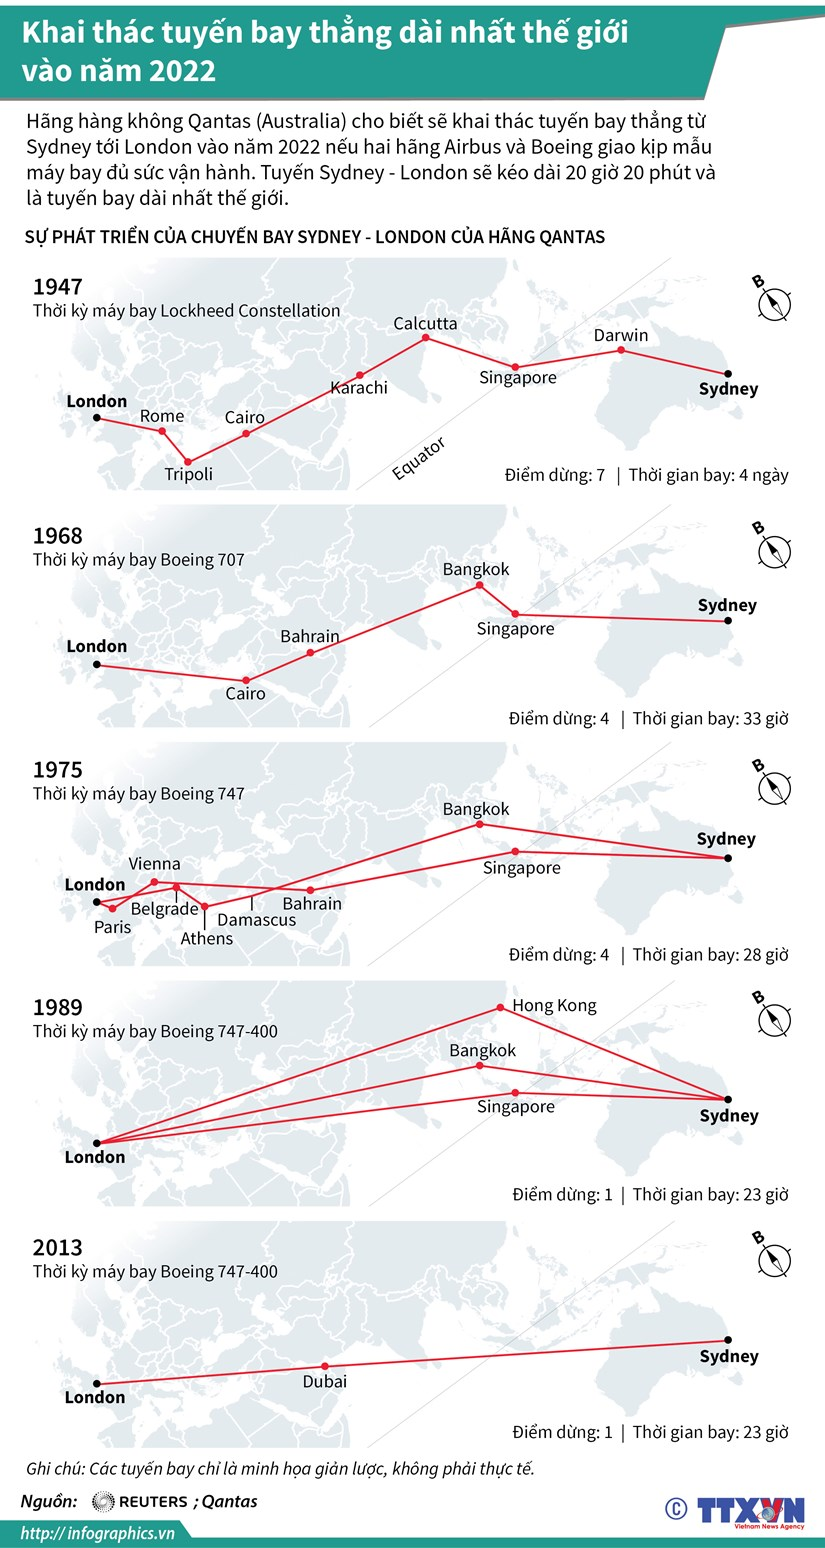 [Infographics] Khai thac tuyen bay thang dai nhat the gioi hinh anh 1